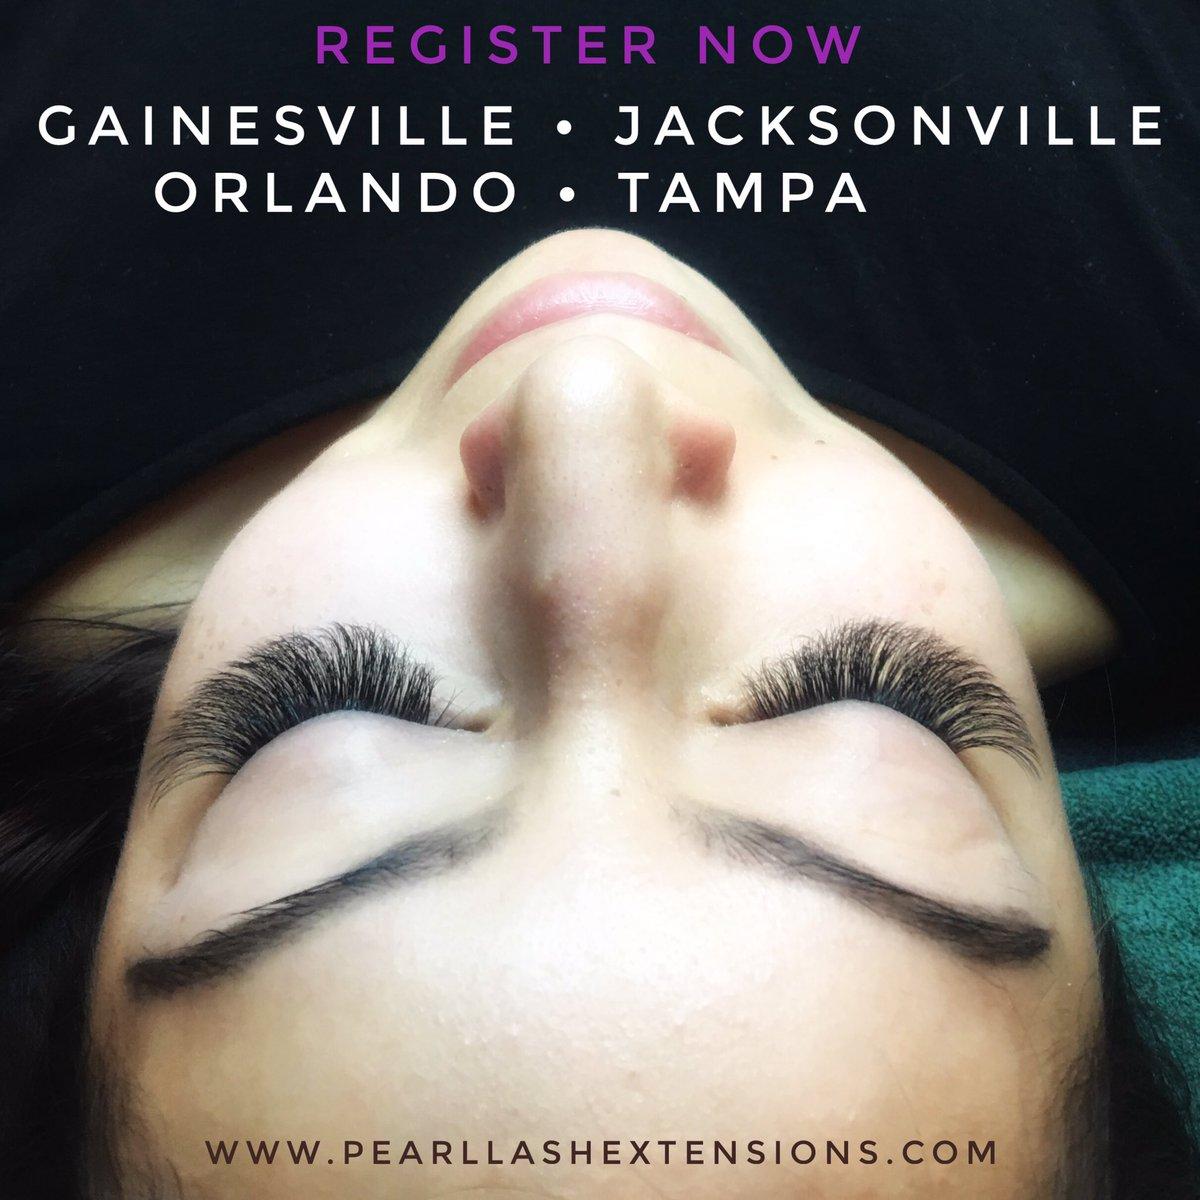 16501ce7ae2 #EyelashExtensions #Training #lashextensions  http://www.PearlLashExtensions.com pic.twitter.com/w3aplpgmjf